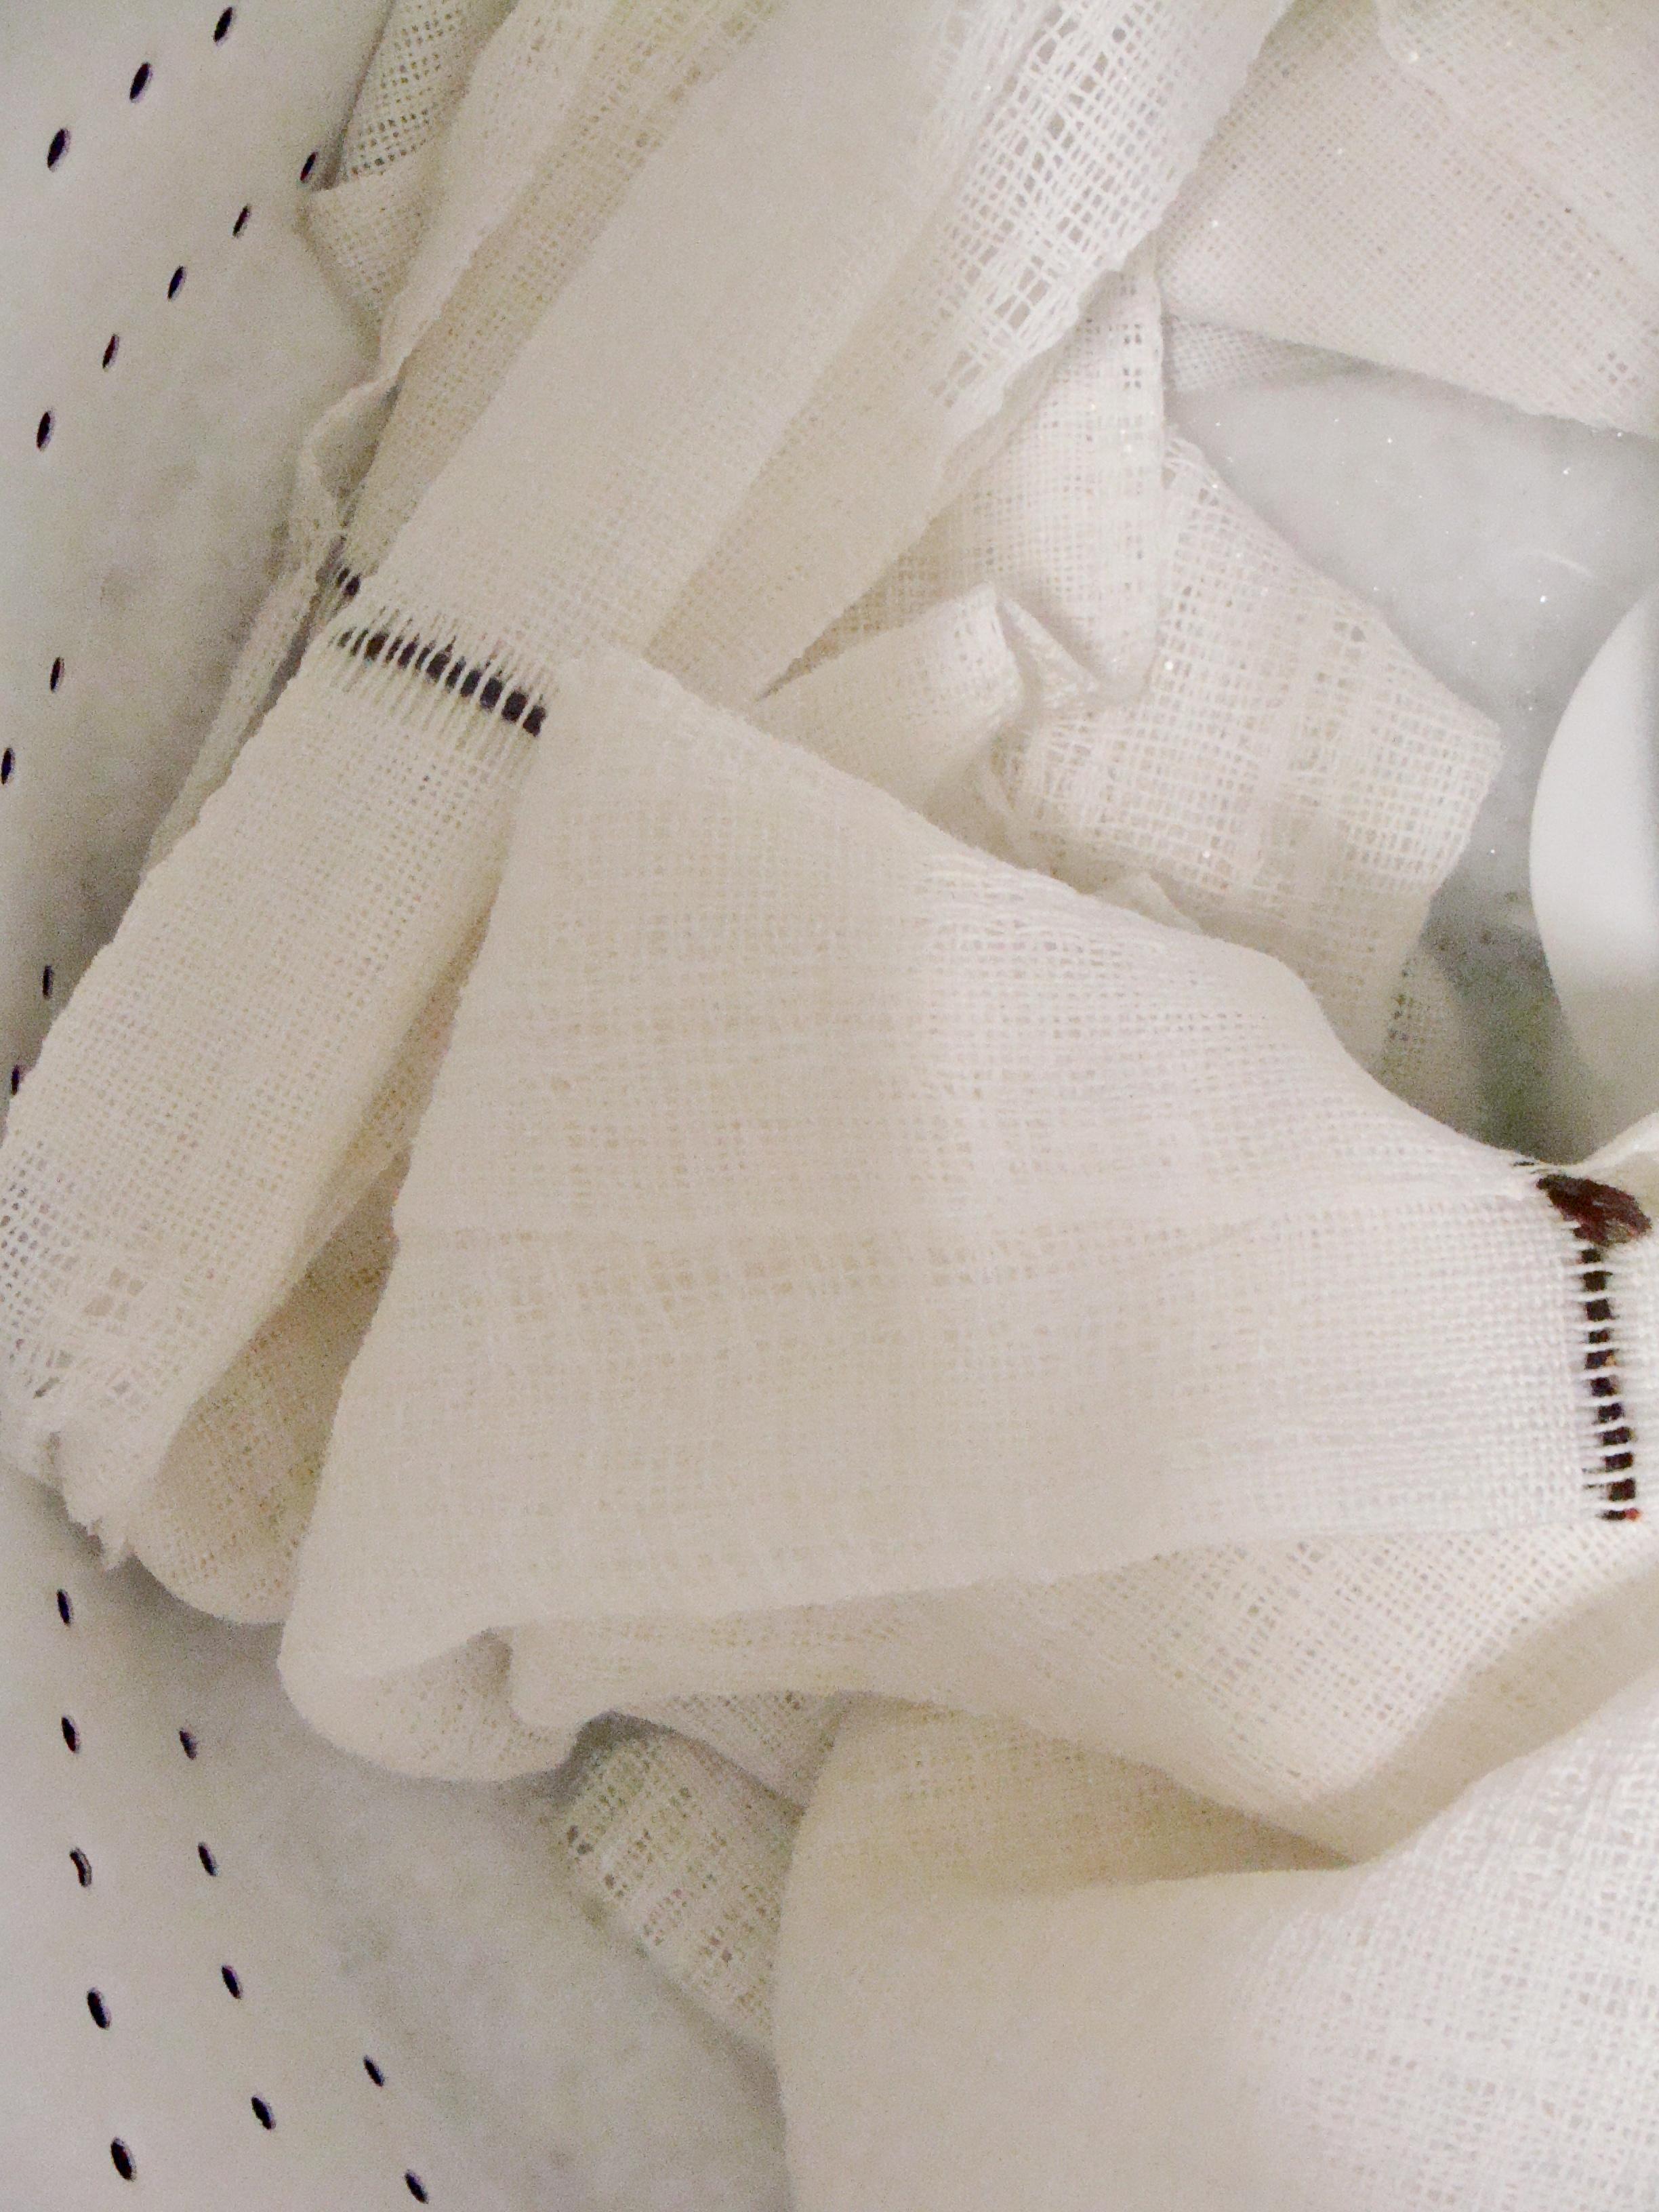 washing woven towels